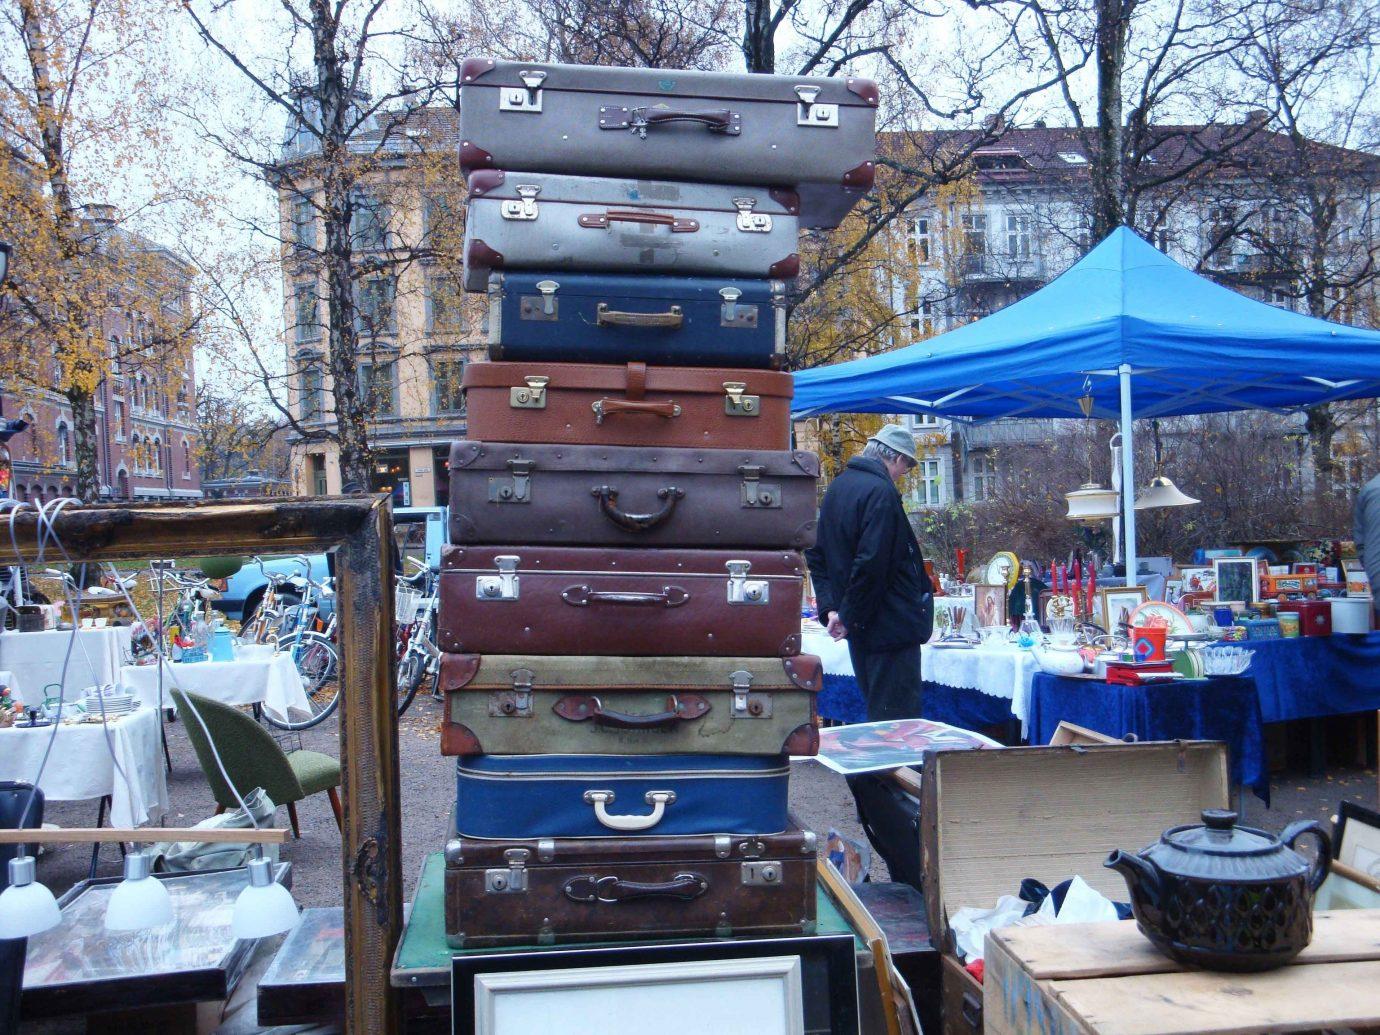 Trip Ideas tree outdoor City public space human settlement market vehicle several